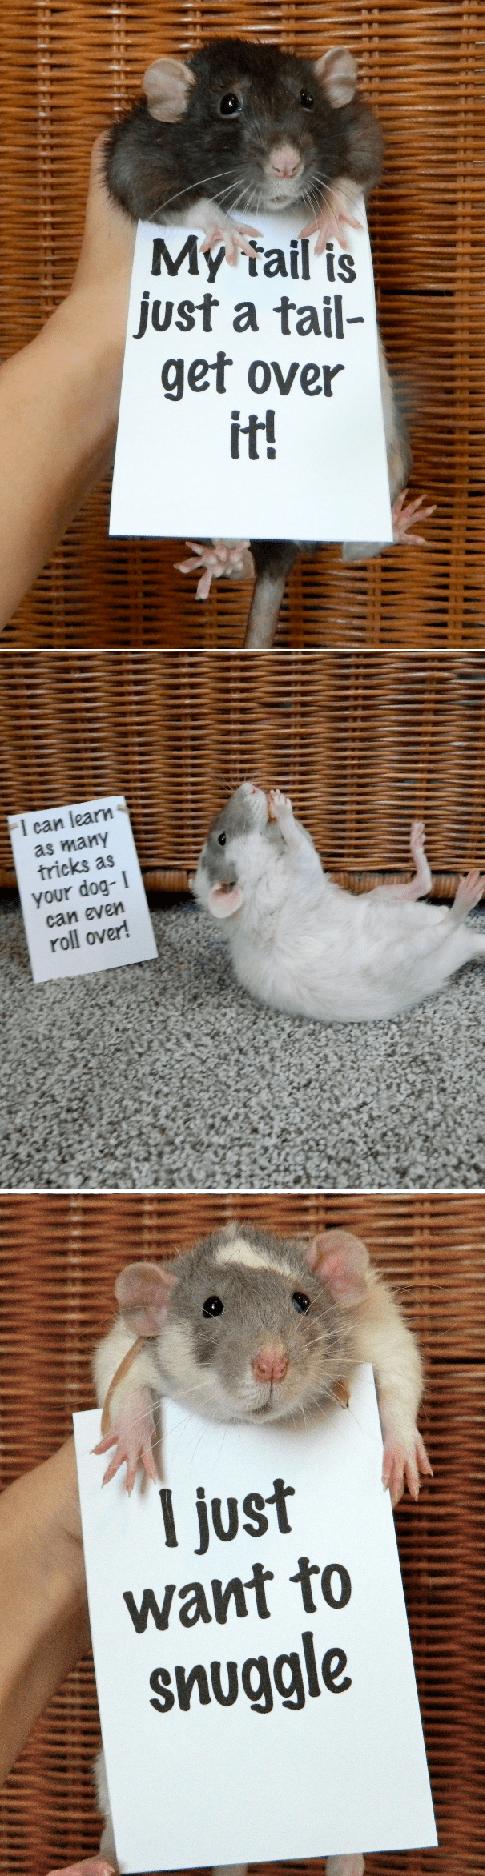 rats pets psa rodent love - 6994076672